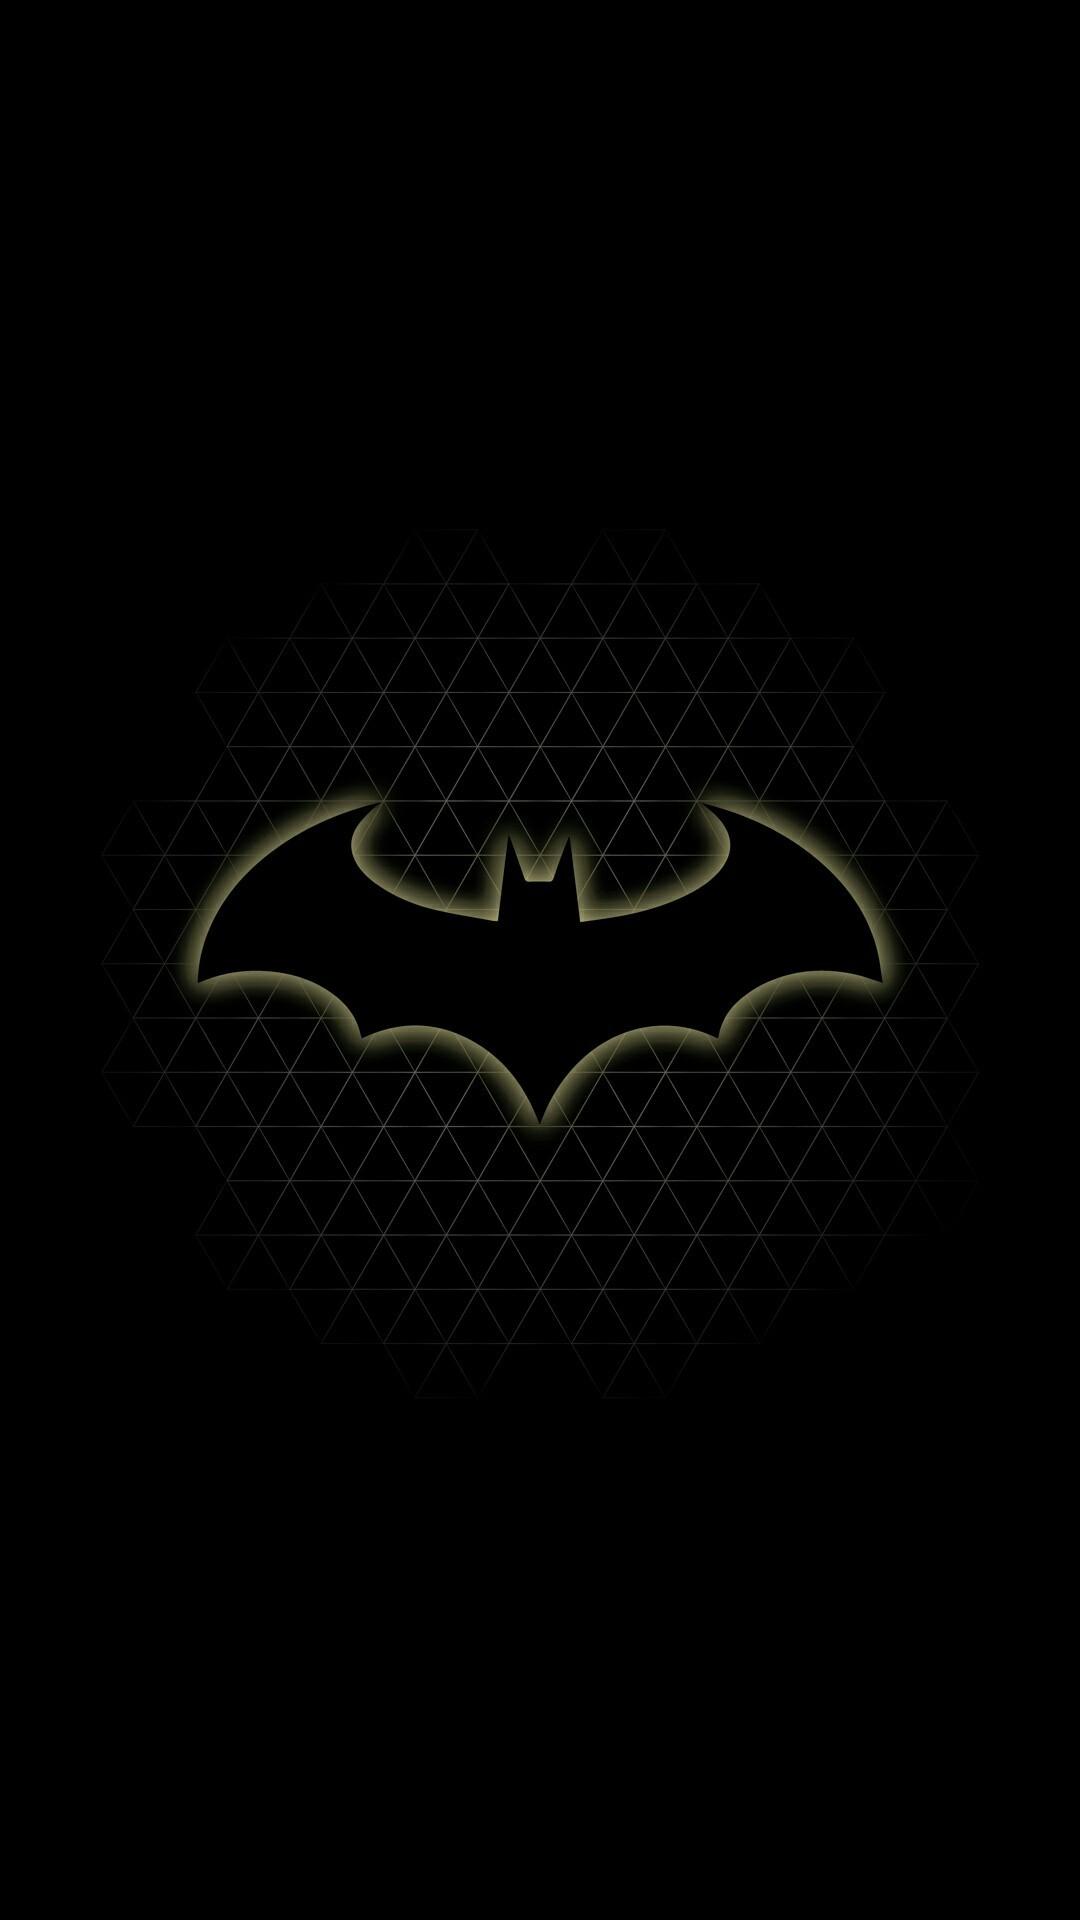 Batman dark knight. Batman PosterBatman LogoBatman WallpaperIphone …